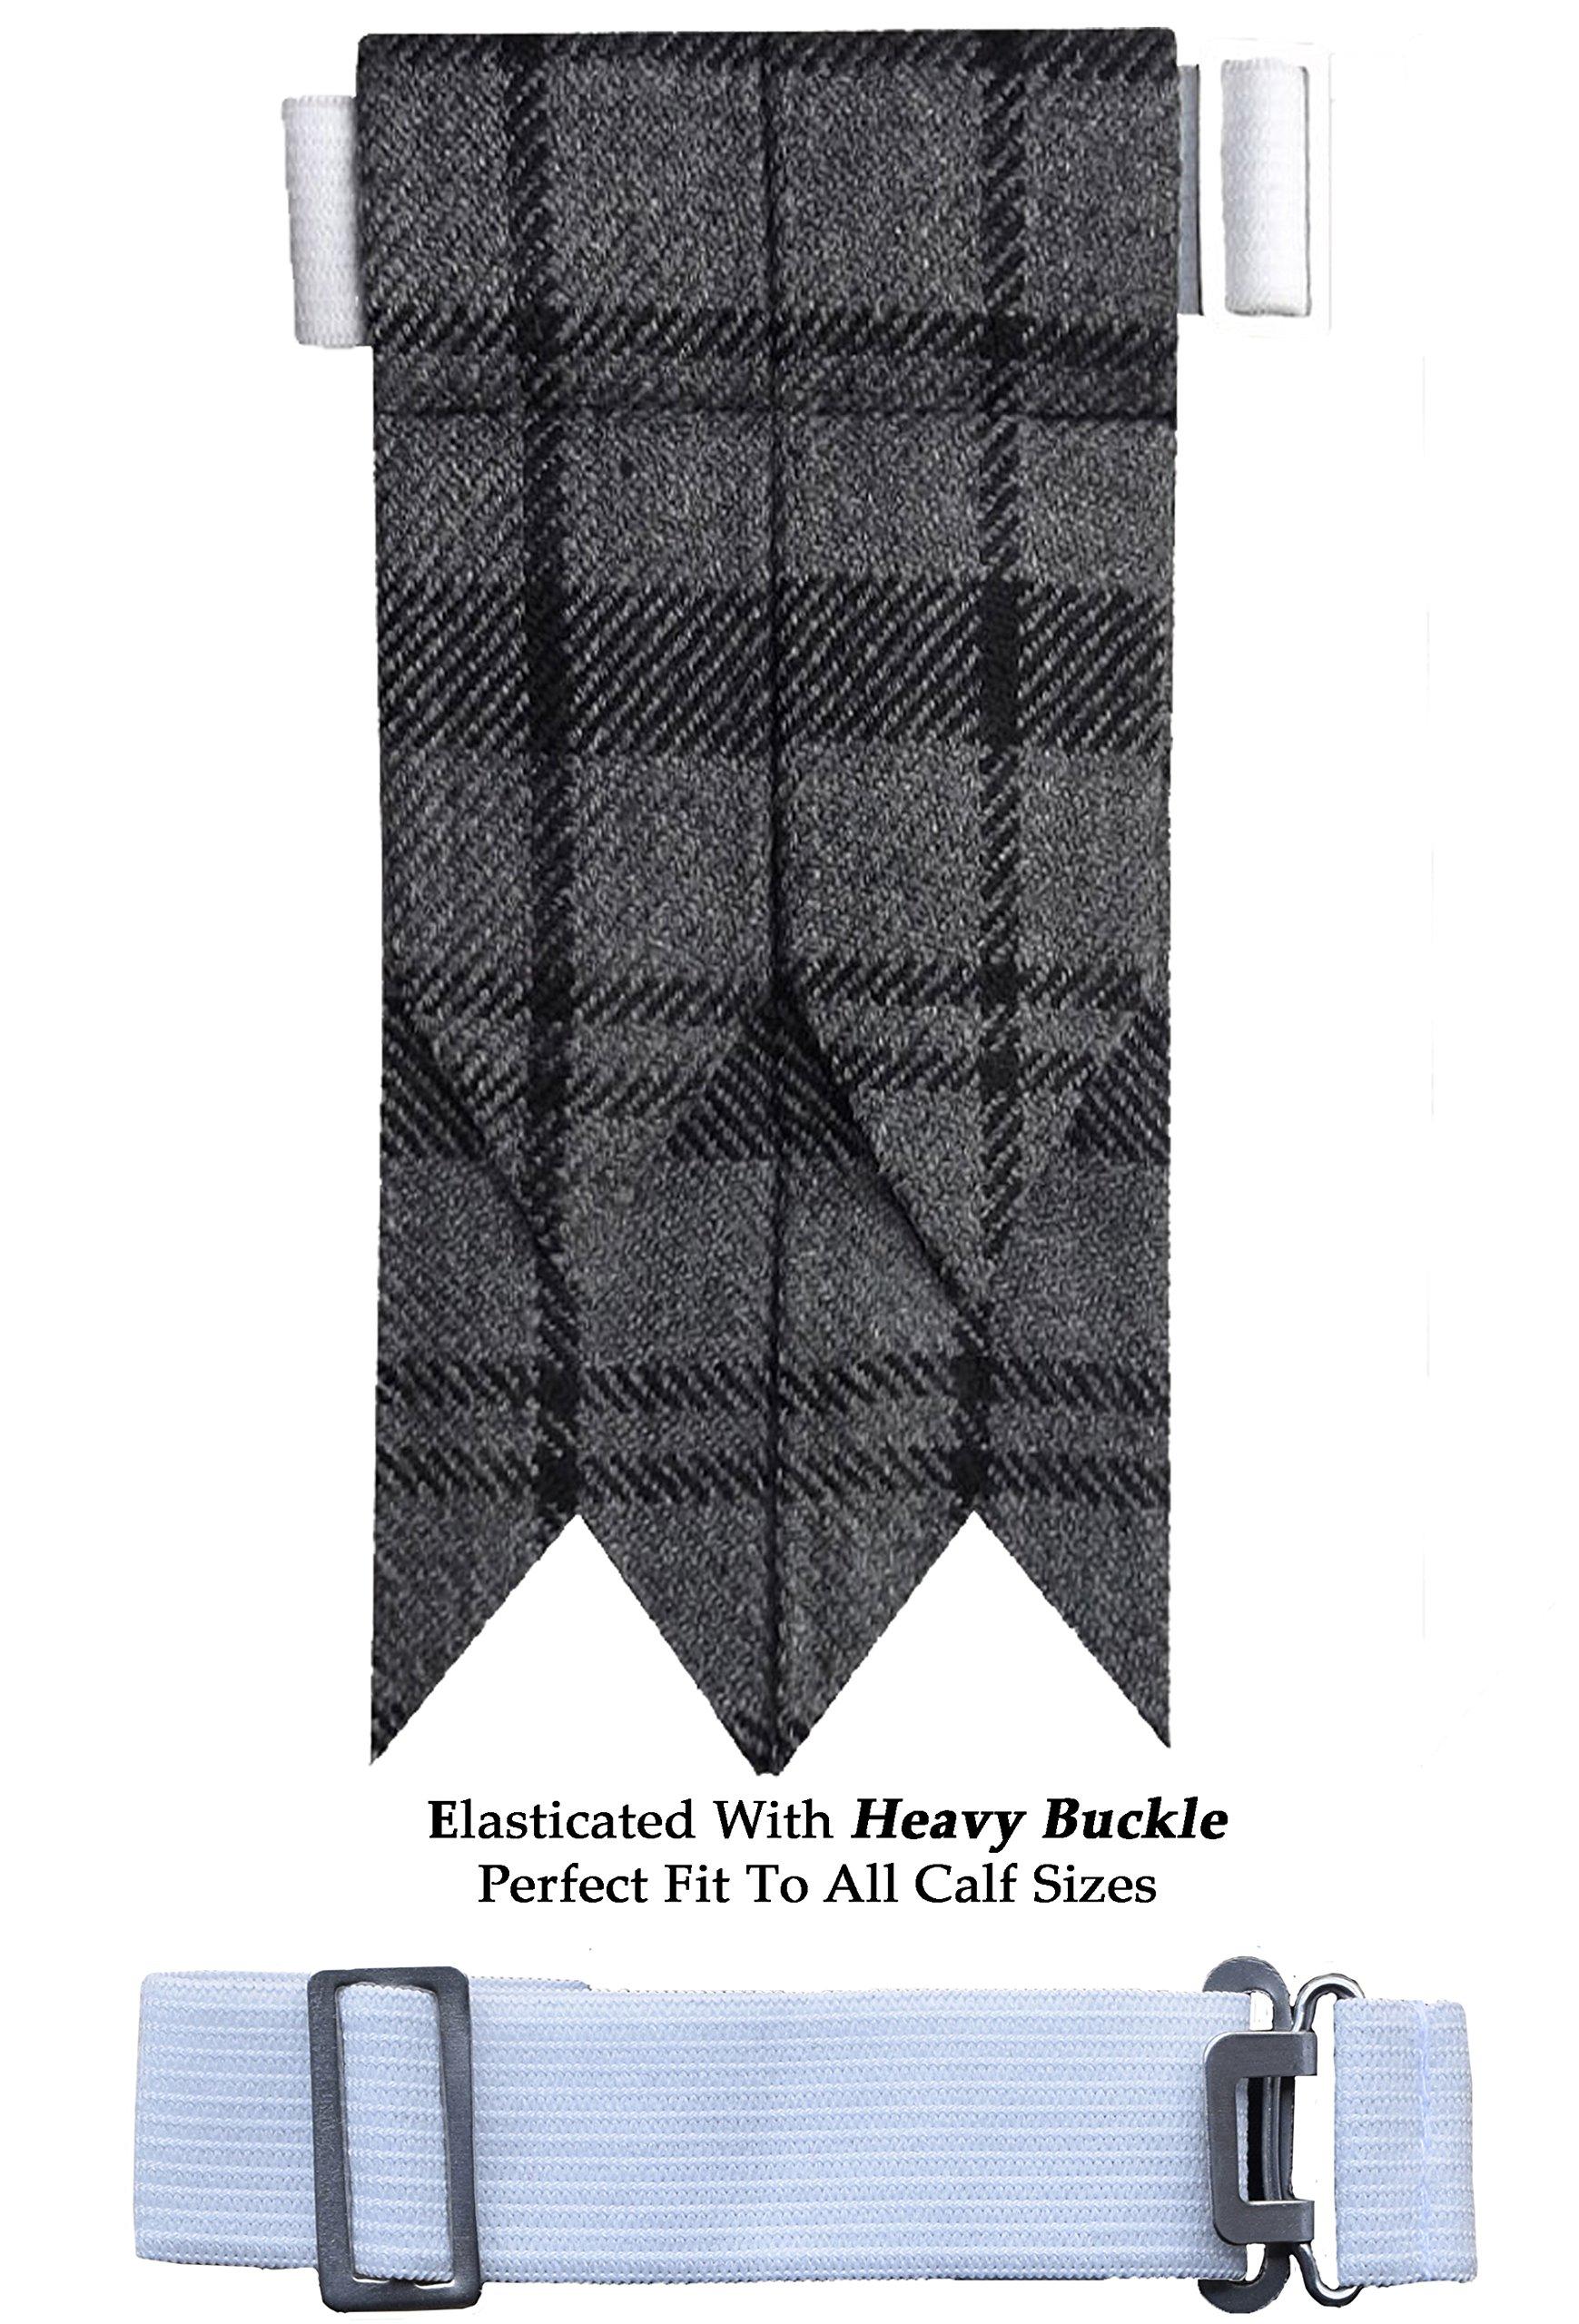 New Solid Plain Black, Royal Stewart Tartan Many More Kilt Flashes Multi Colors (Hamilton Grey)